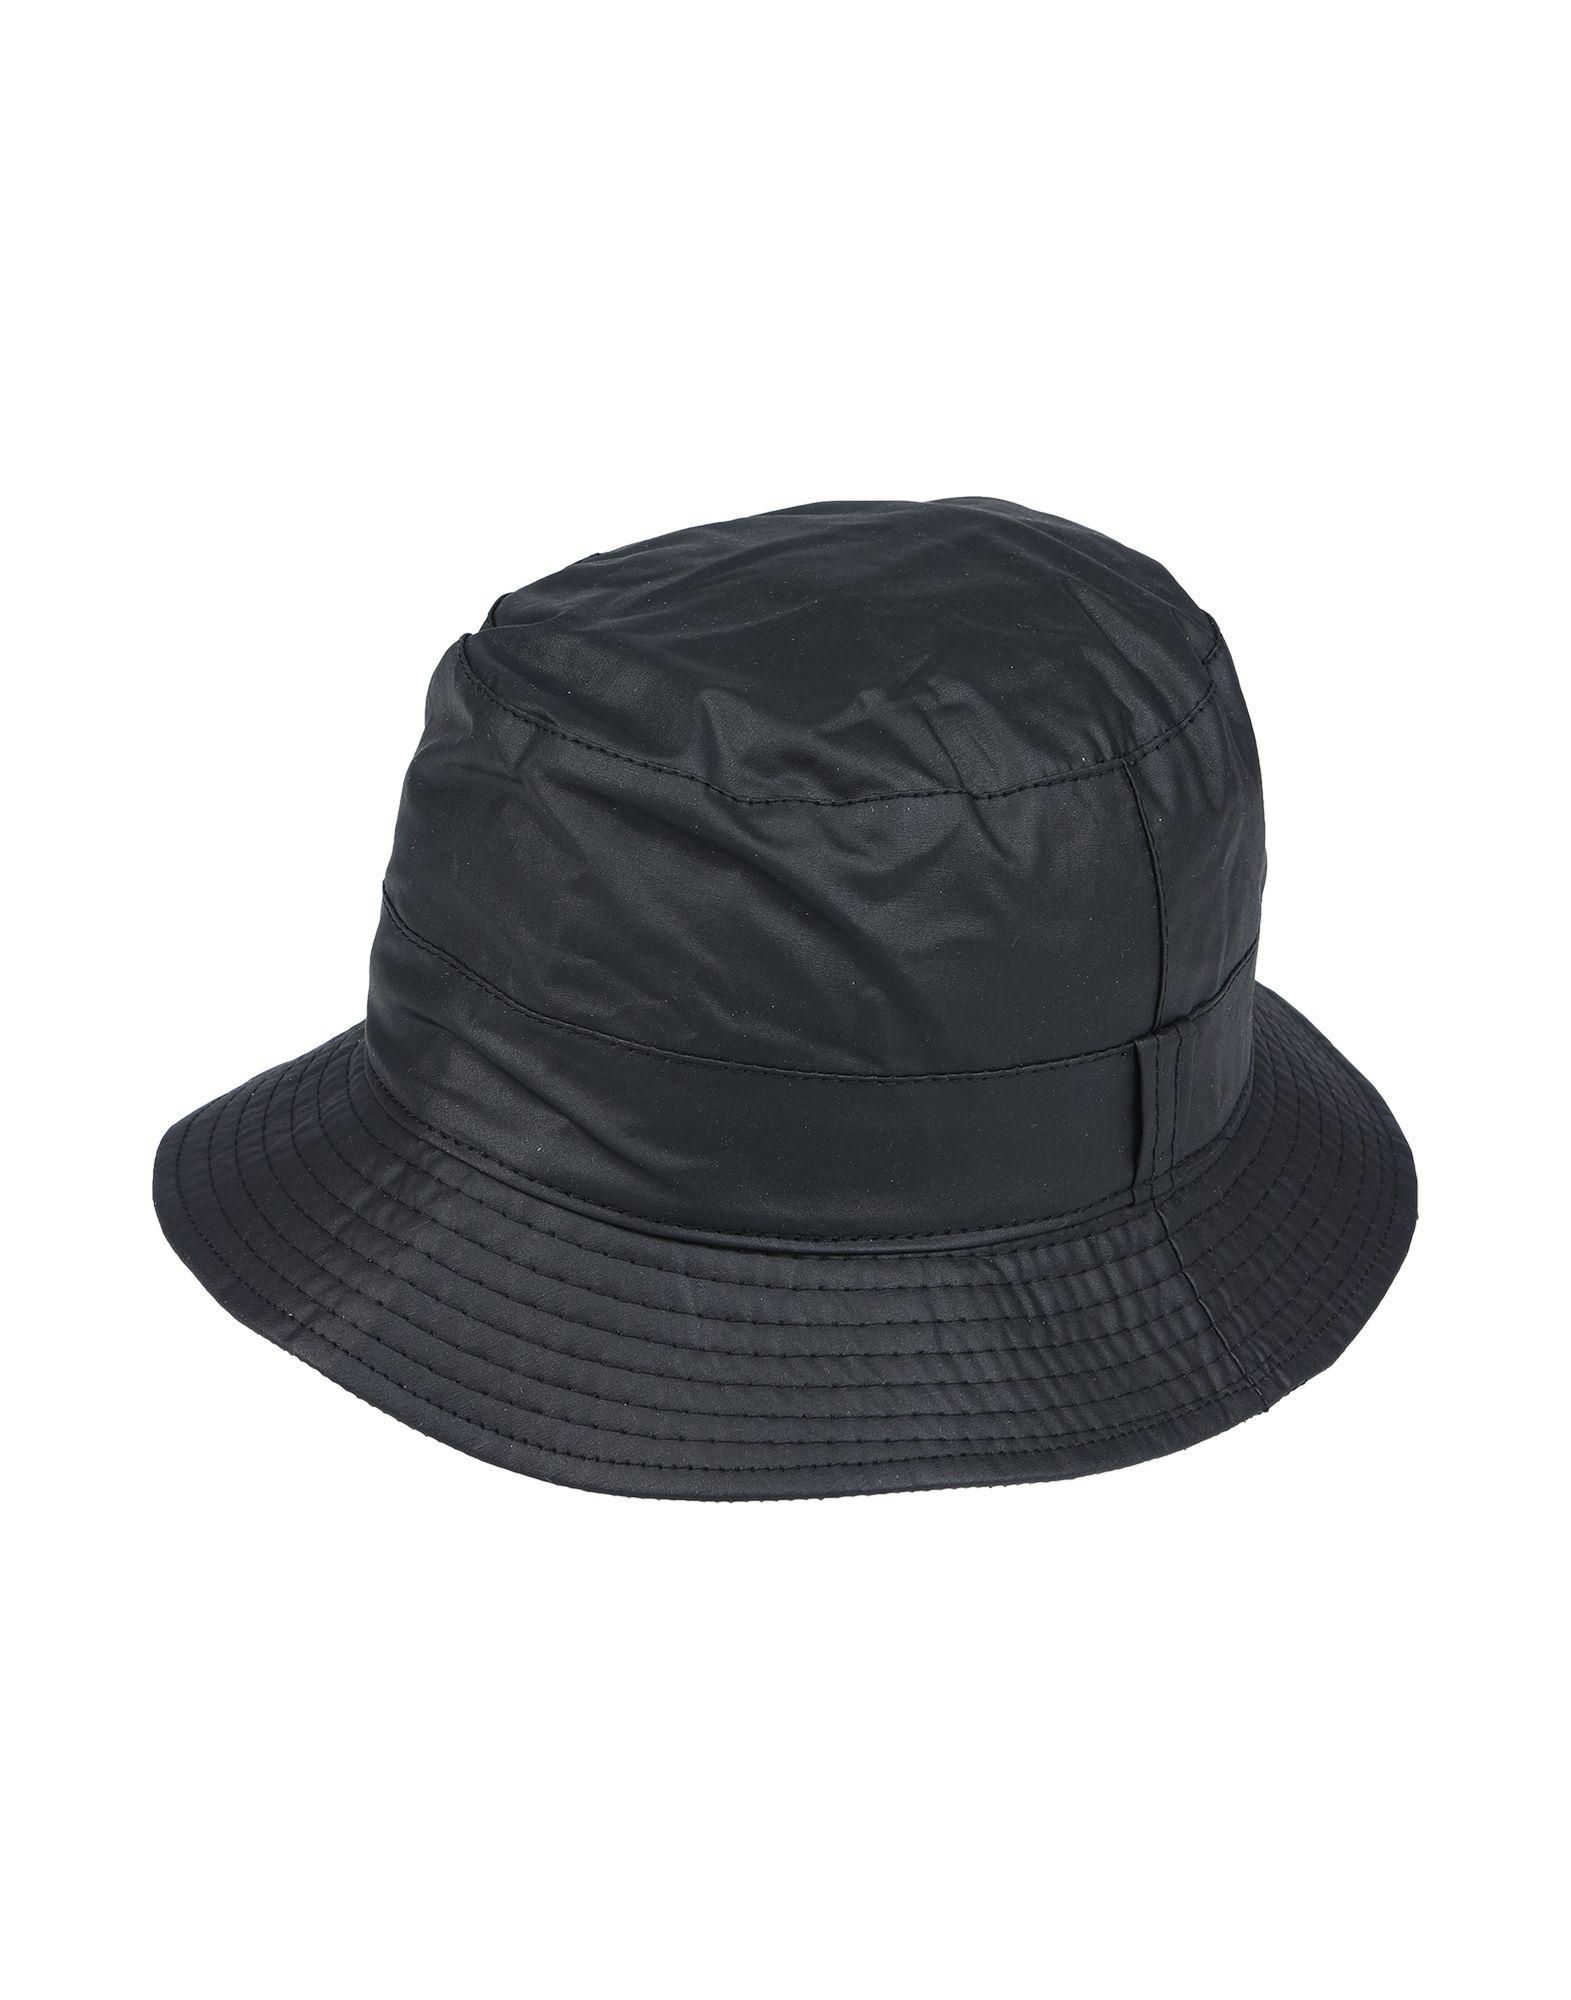 4494da0a0e2 Panizza Hat - Women Panizza Hats online on YOOX Hong Kong - 46615530KA